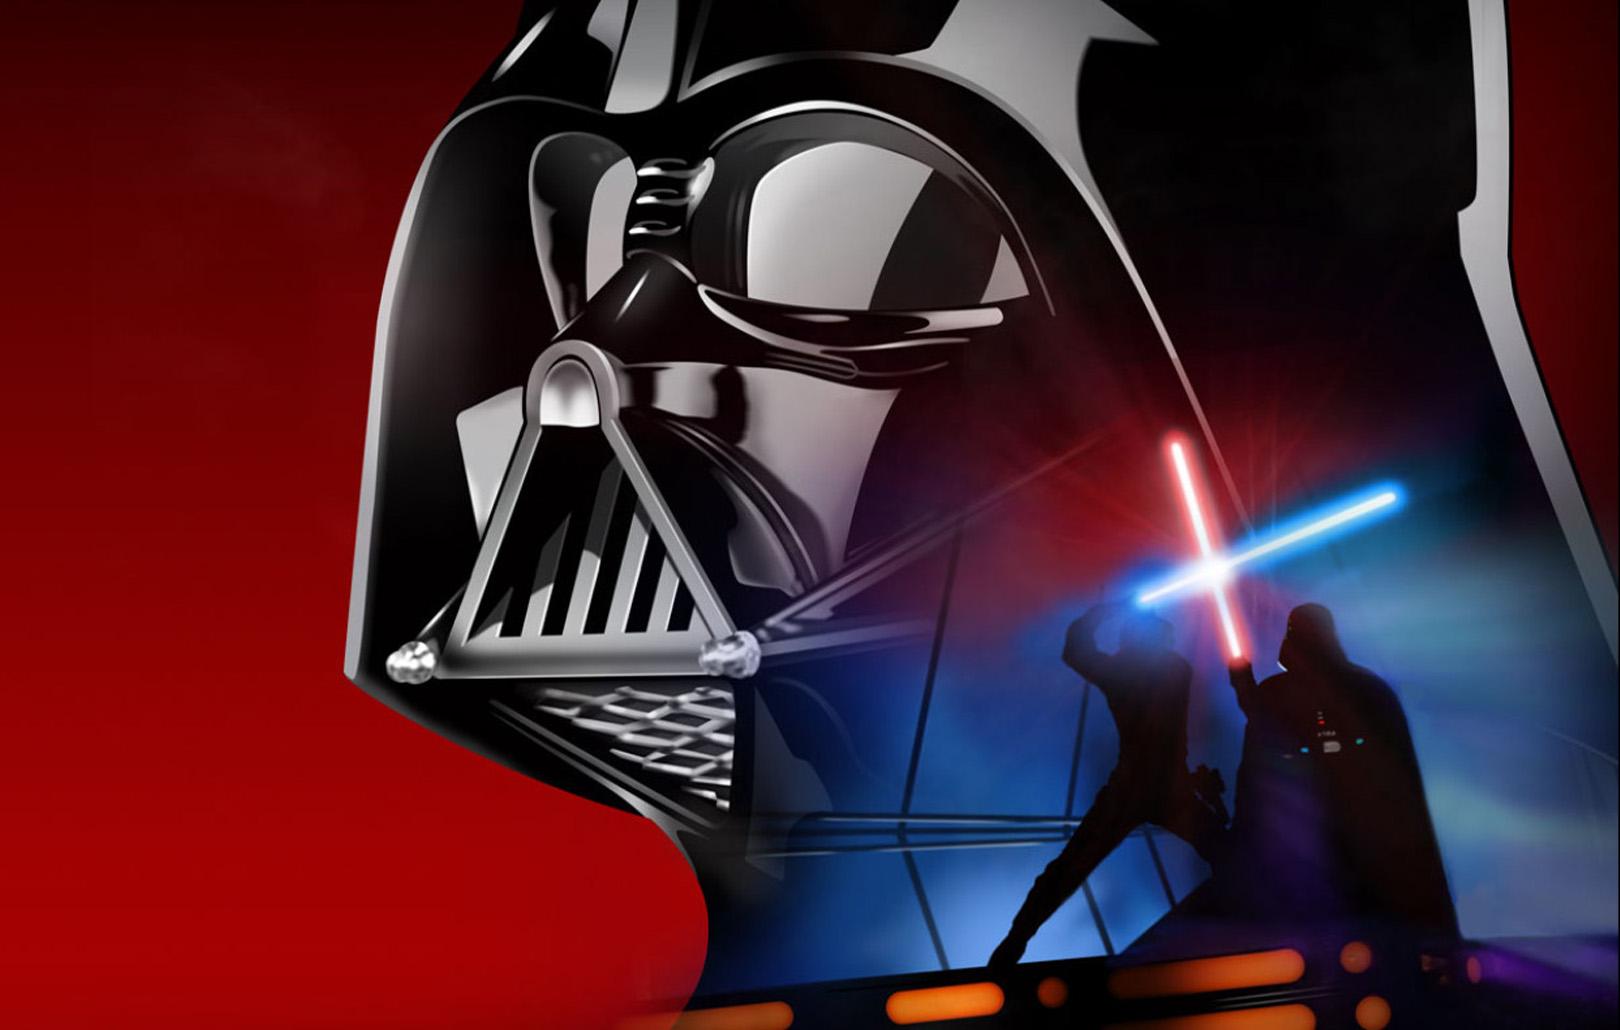 Звёздные войны: все части